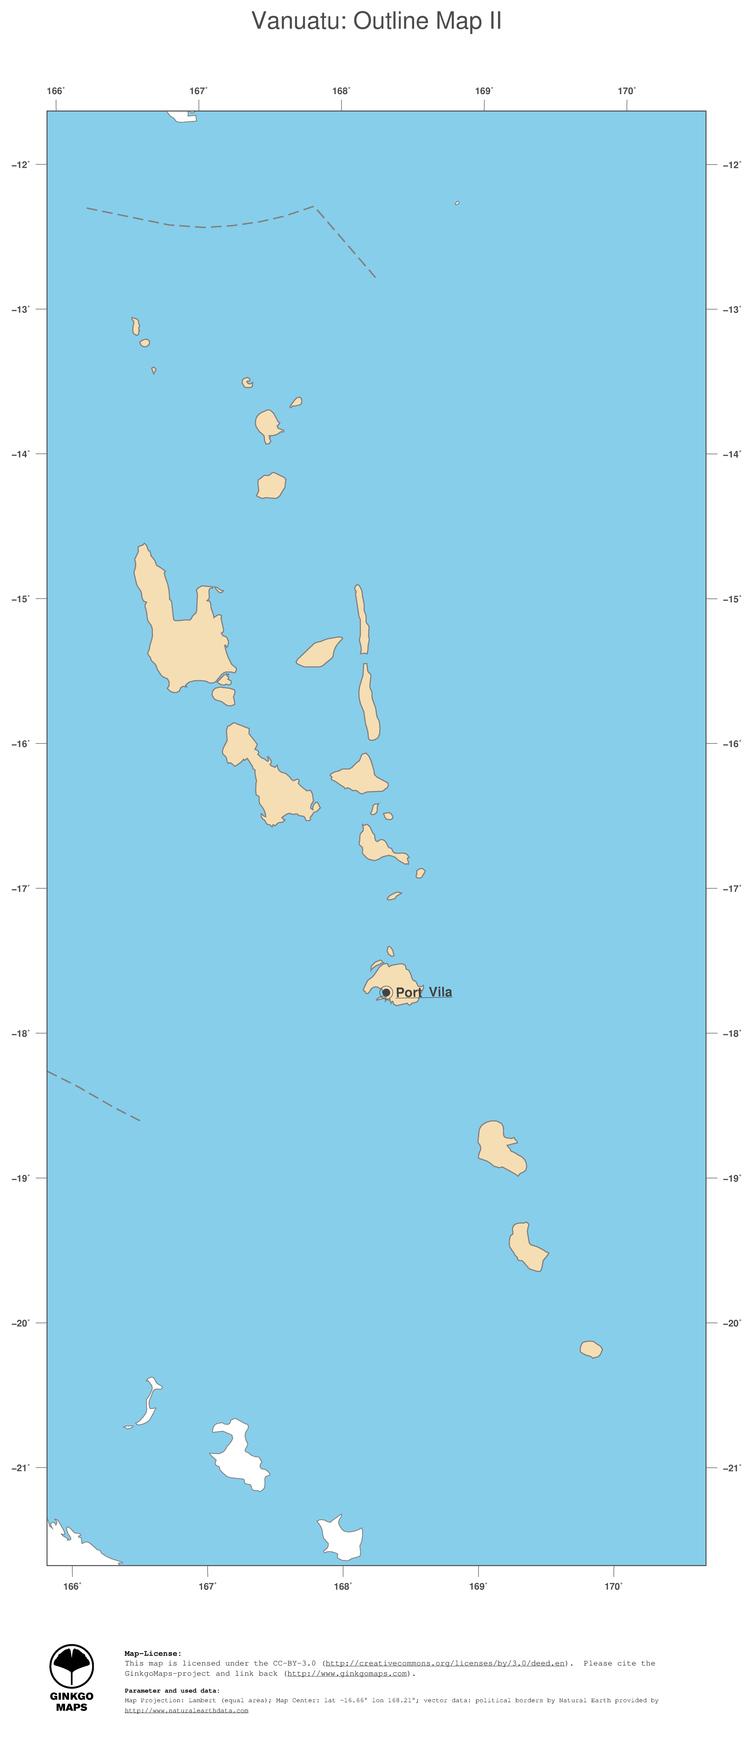 Map Vanuatu GinkgoMaps continent Oceania region Vanuatu